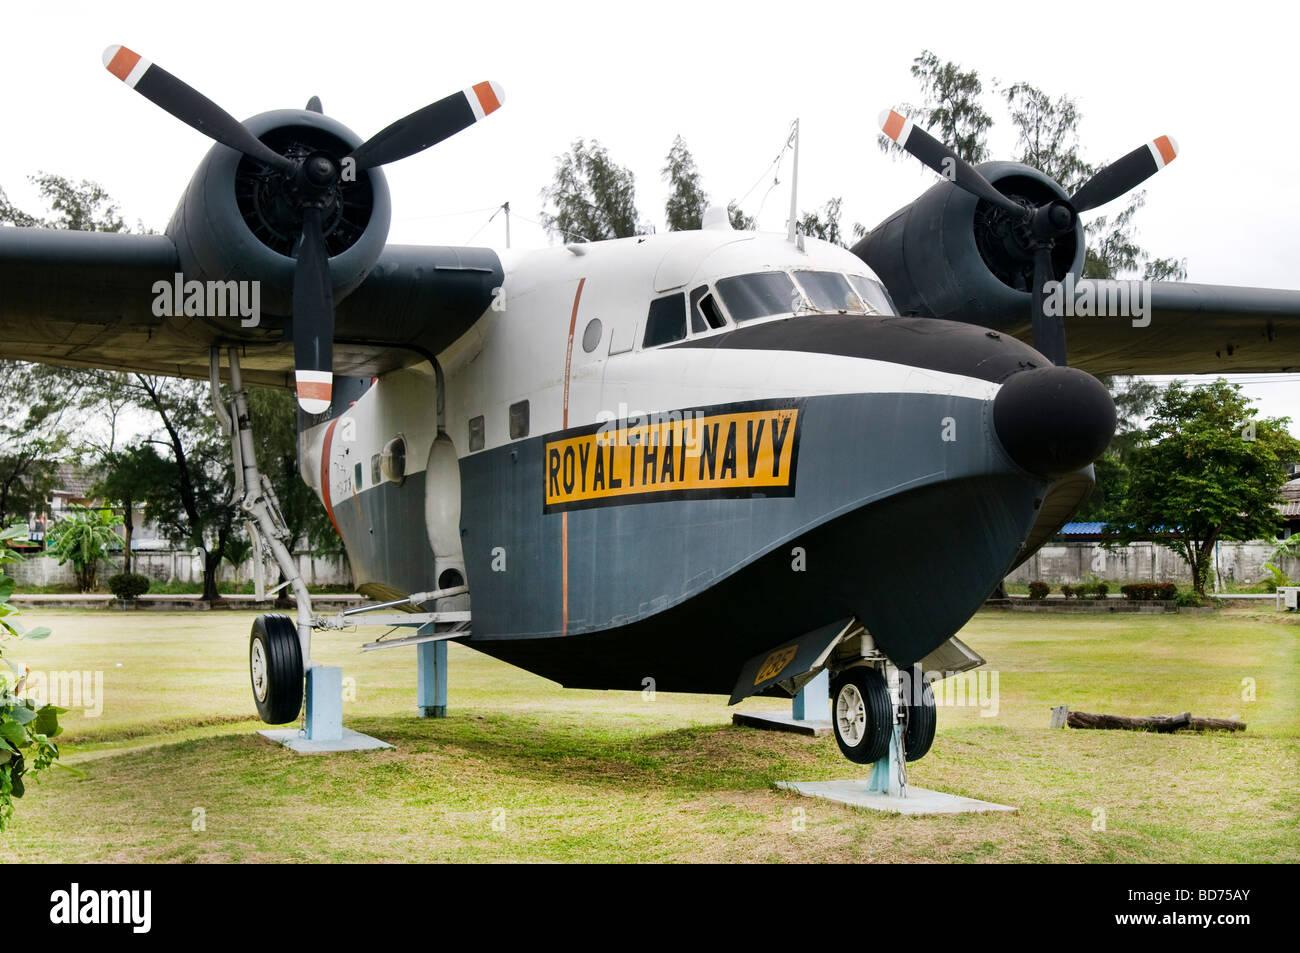 Royal Thai Navy Museum in Samut Prakan Thailand Stock Photo